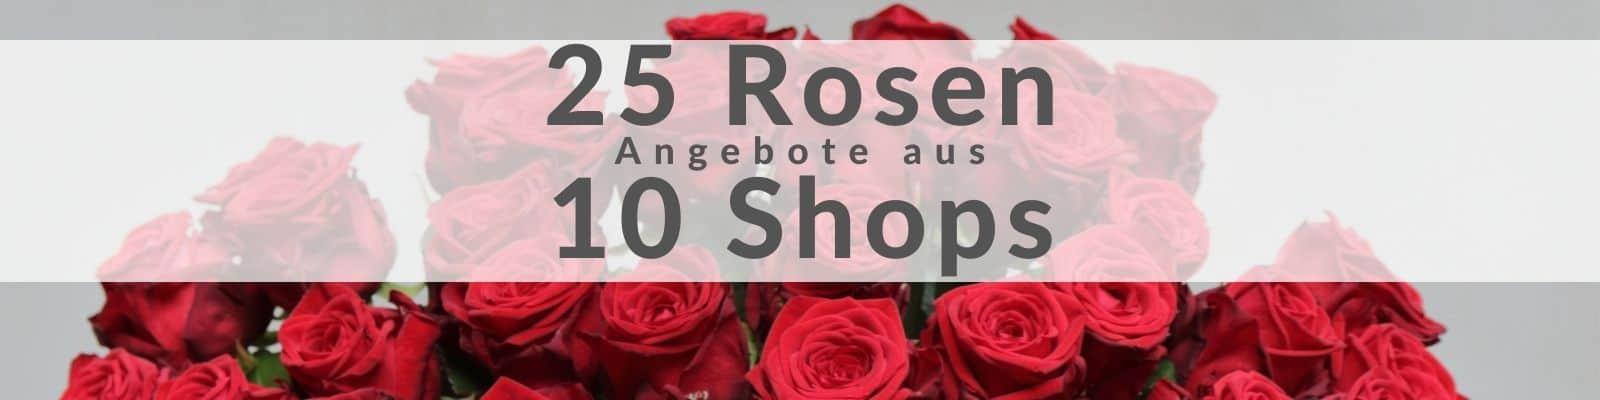 25 Rosen bestellen